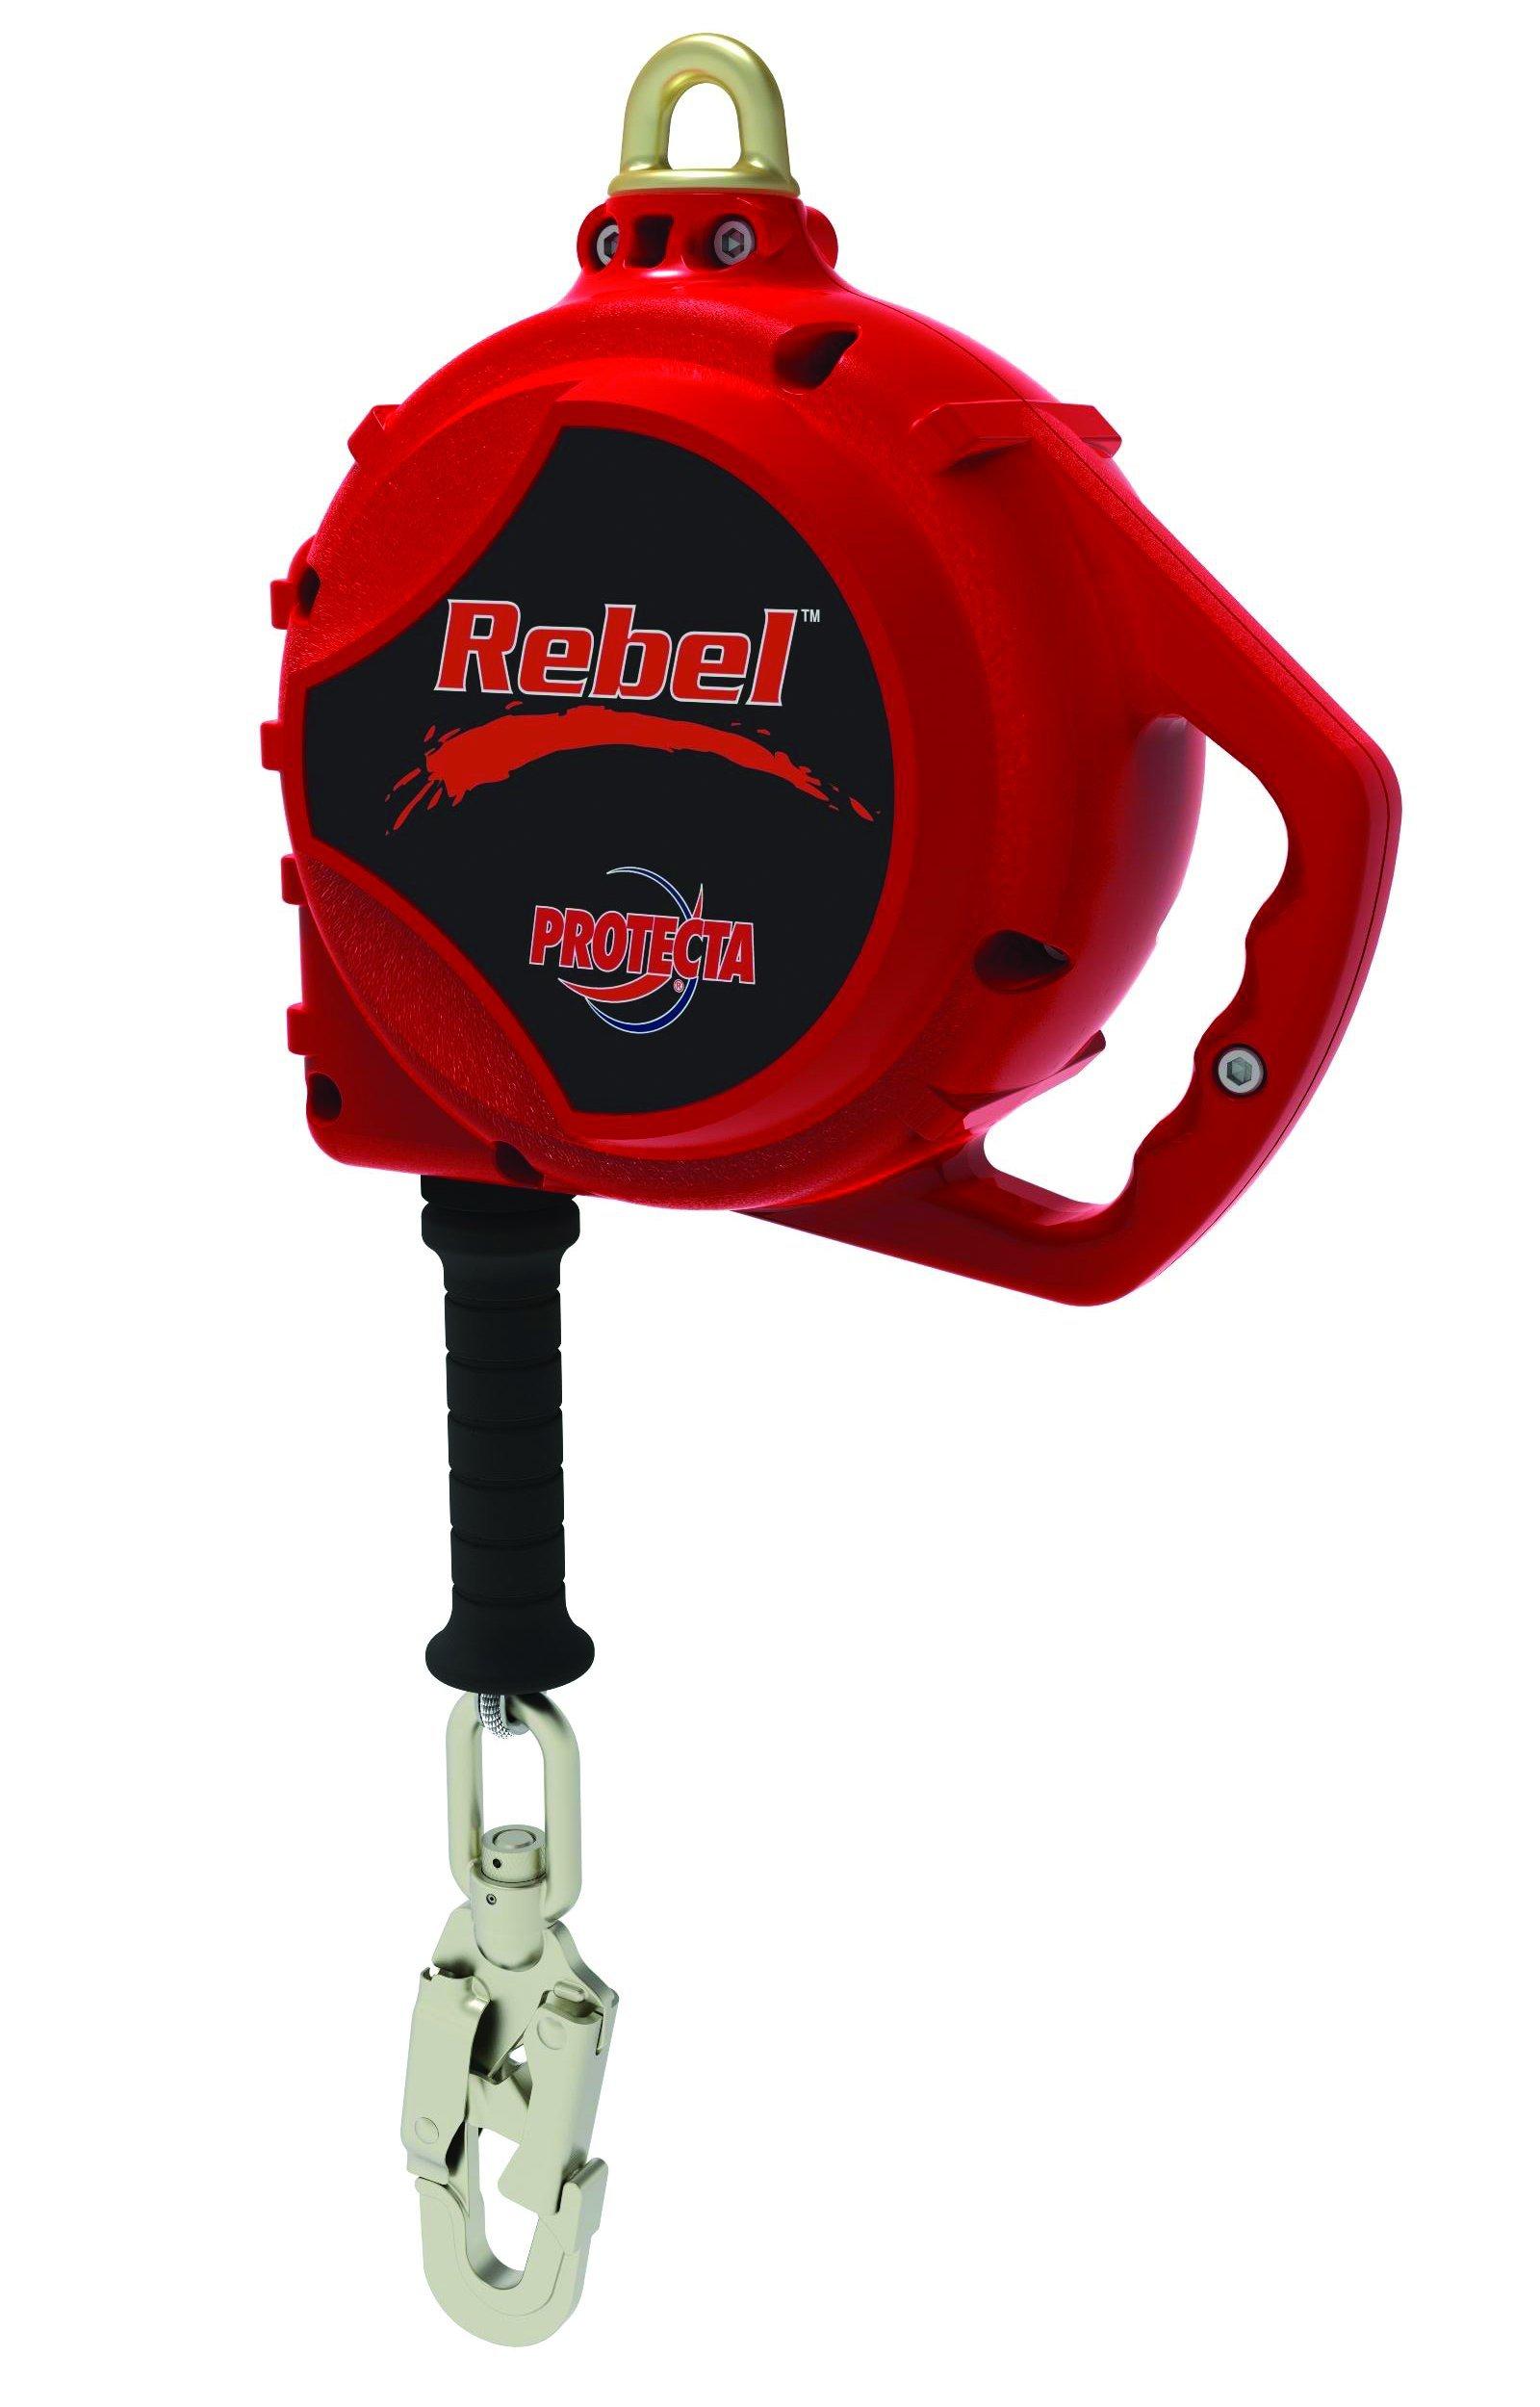 3M Protecta Rebel 3590510 Self Retracting Lifeline, 33' Galvanized Cable, Aluminum Housing, Carabiner, 420 lb Capacity, Red